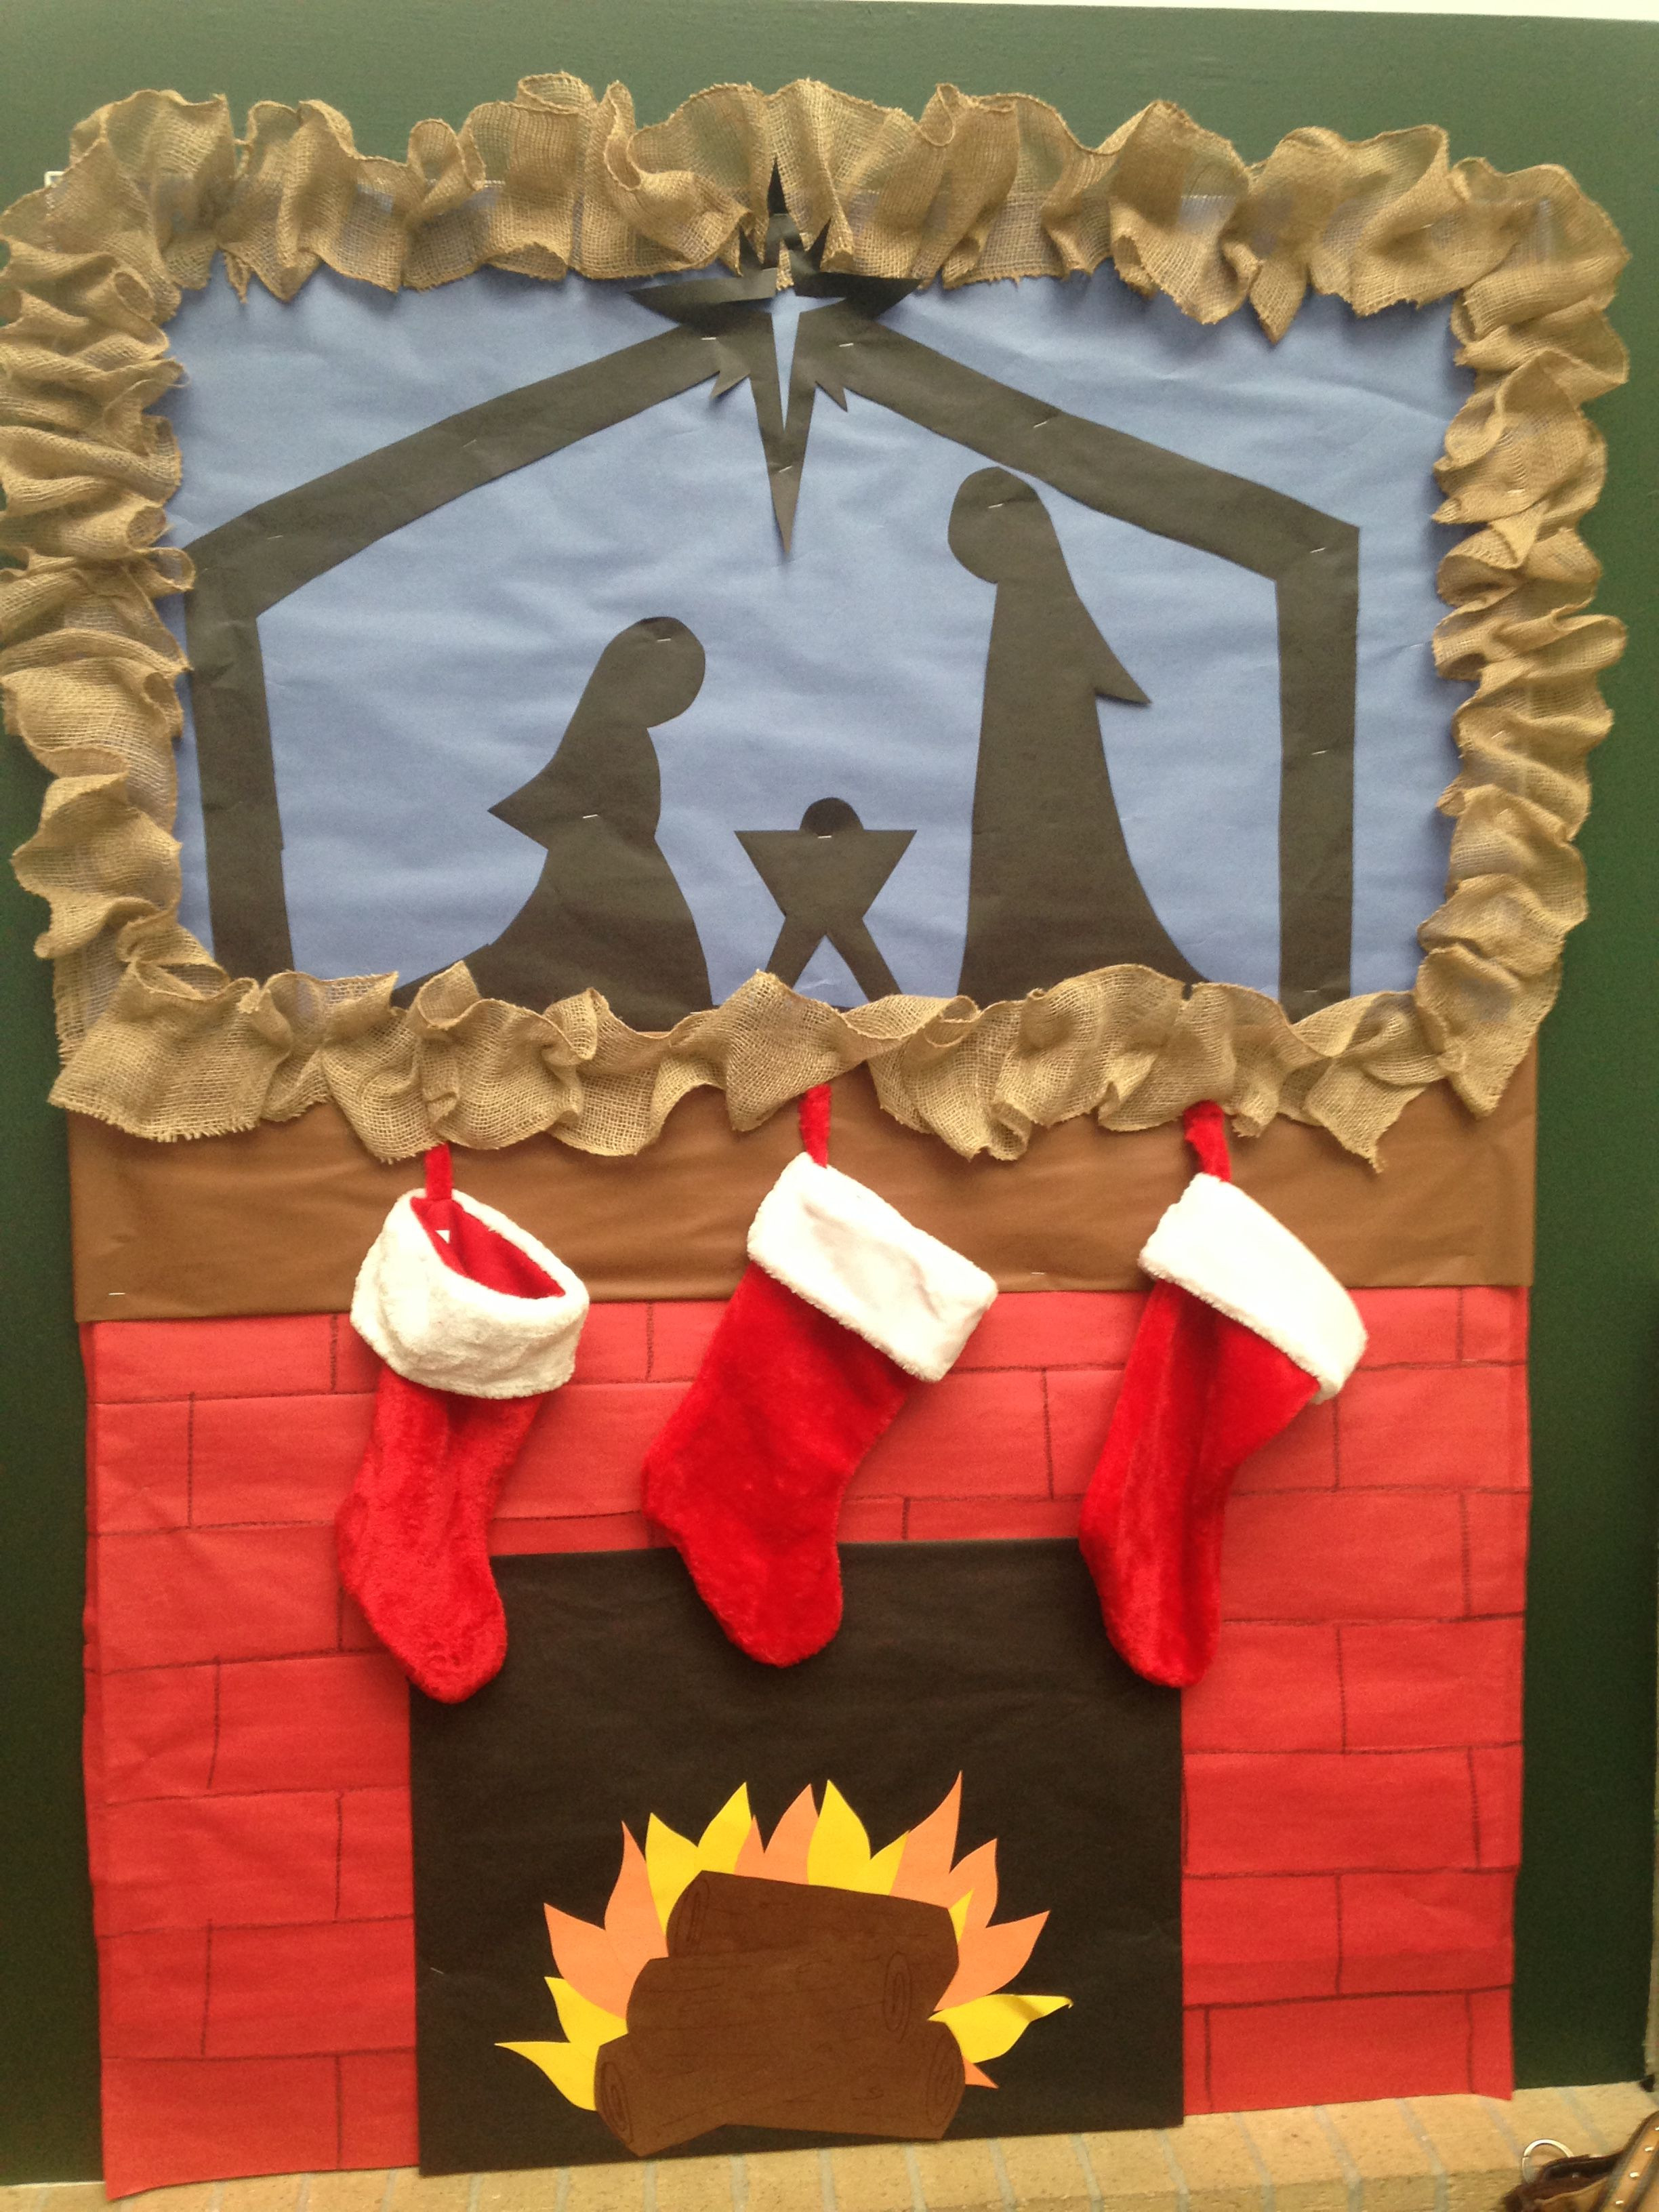 Fireplace Bulletin Board Christmas  Nativity bulletin board for Christmas plete with